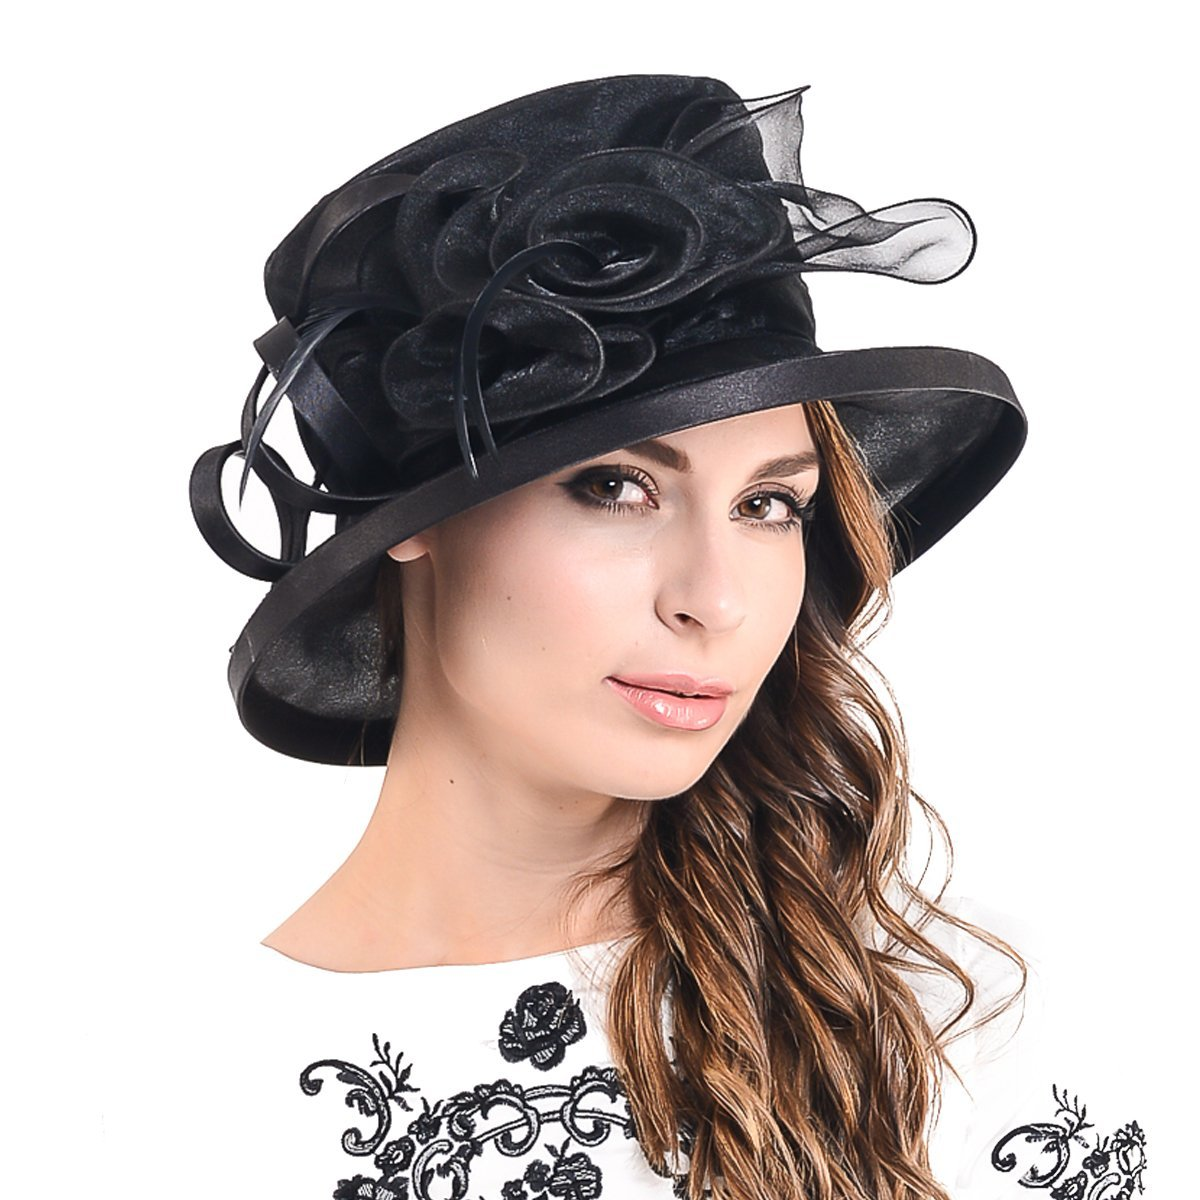 65aab06b269 Kentucky Derby Dress Church Cloche Hat Sweet Cute Floral Bucket Hat  F-S606-Green